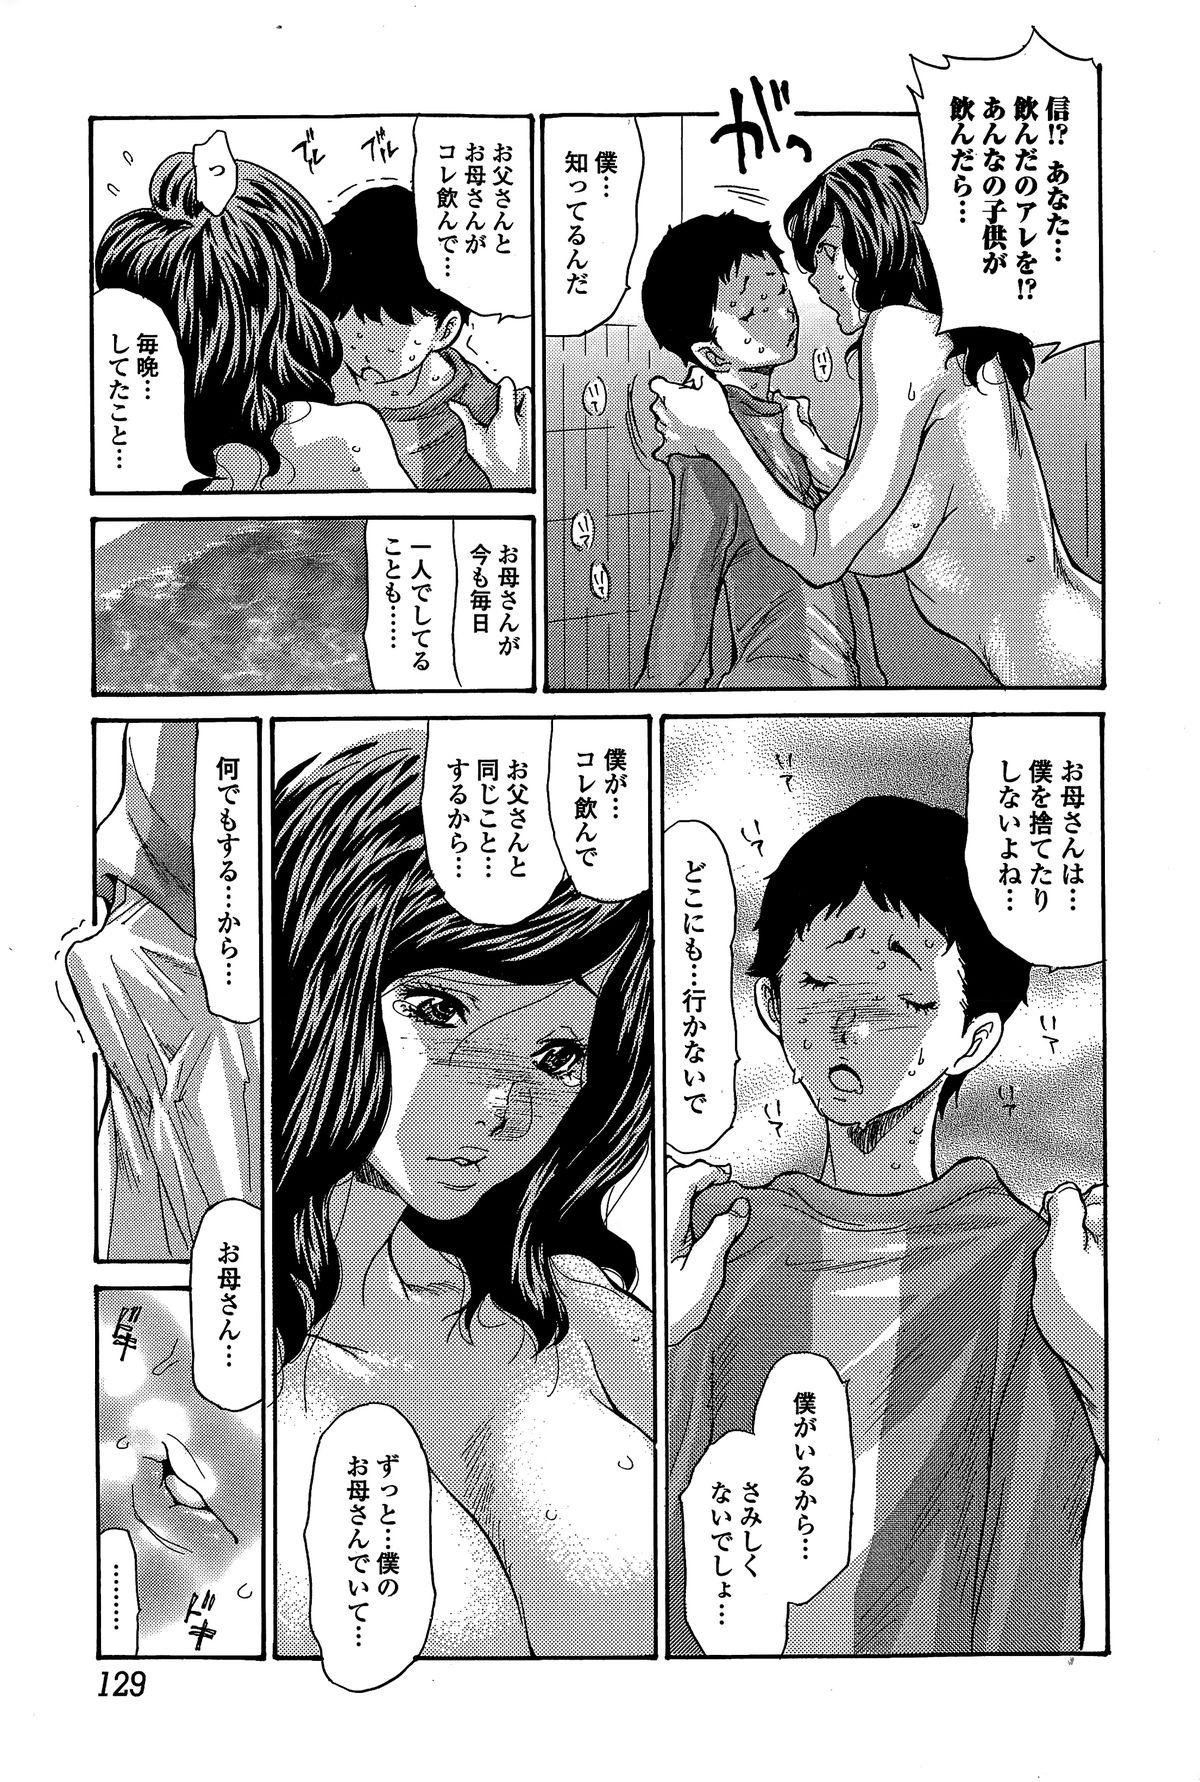 Comic Toutetsu 2015-02 Vol. 3 128